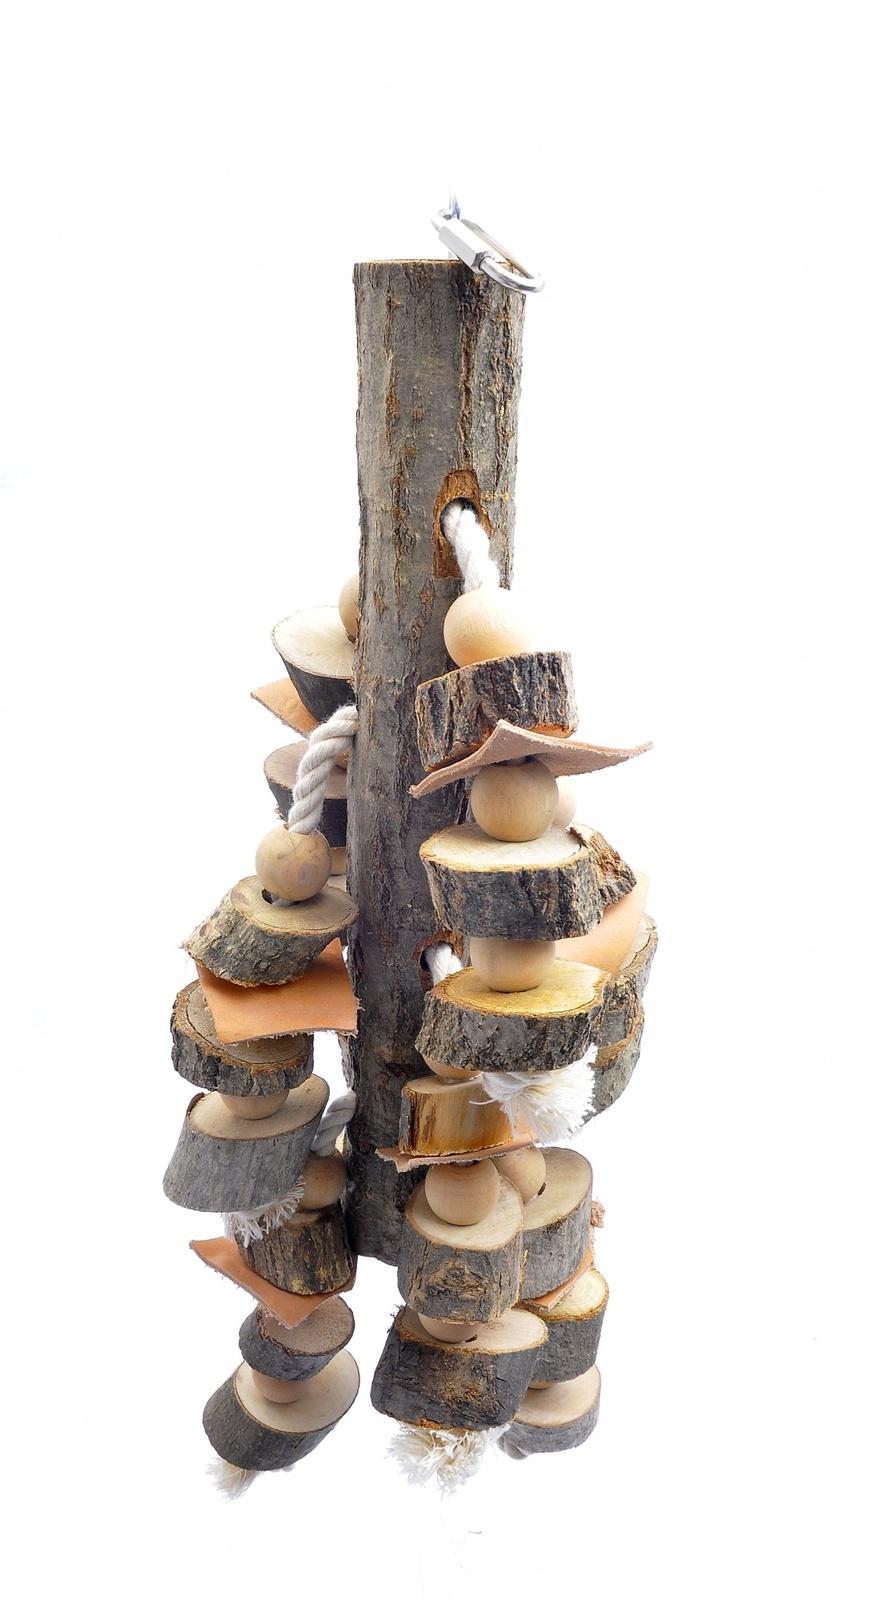 "Benelux Игрушка для длиннохвостых попугаев ""Мега дразнилка"" 72*28 см (Сoco toy xxl for parrot/parrakeet) 14438 от Ravta"